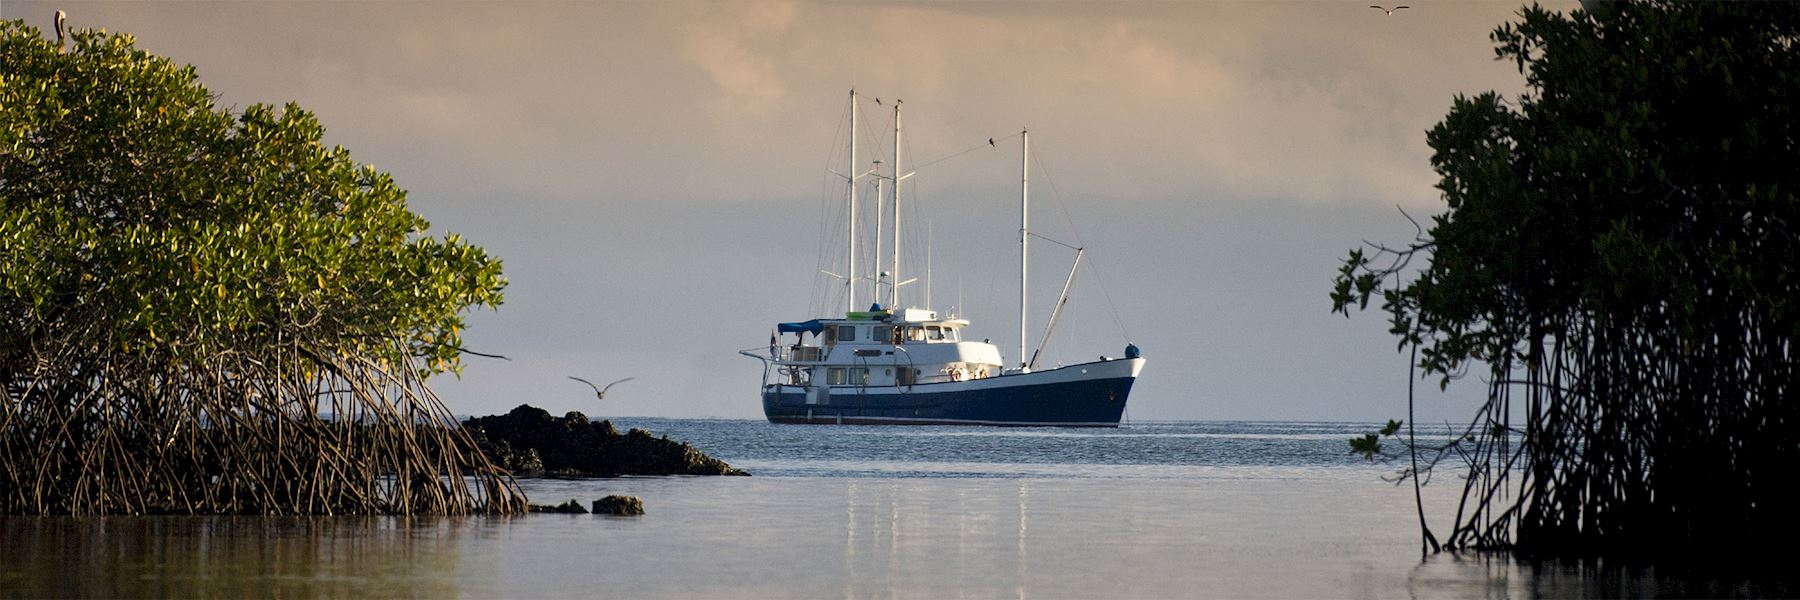 MY Samba Galapagos Cruises Audley Travel - Cruise ships to the galapagos islands